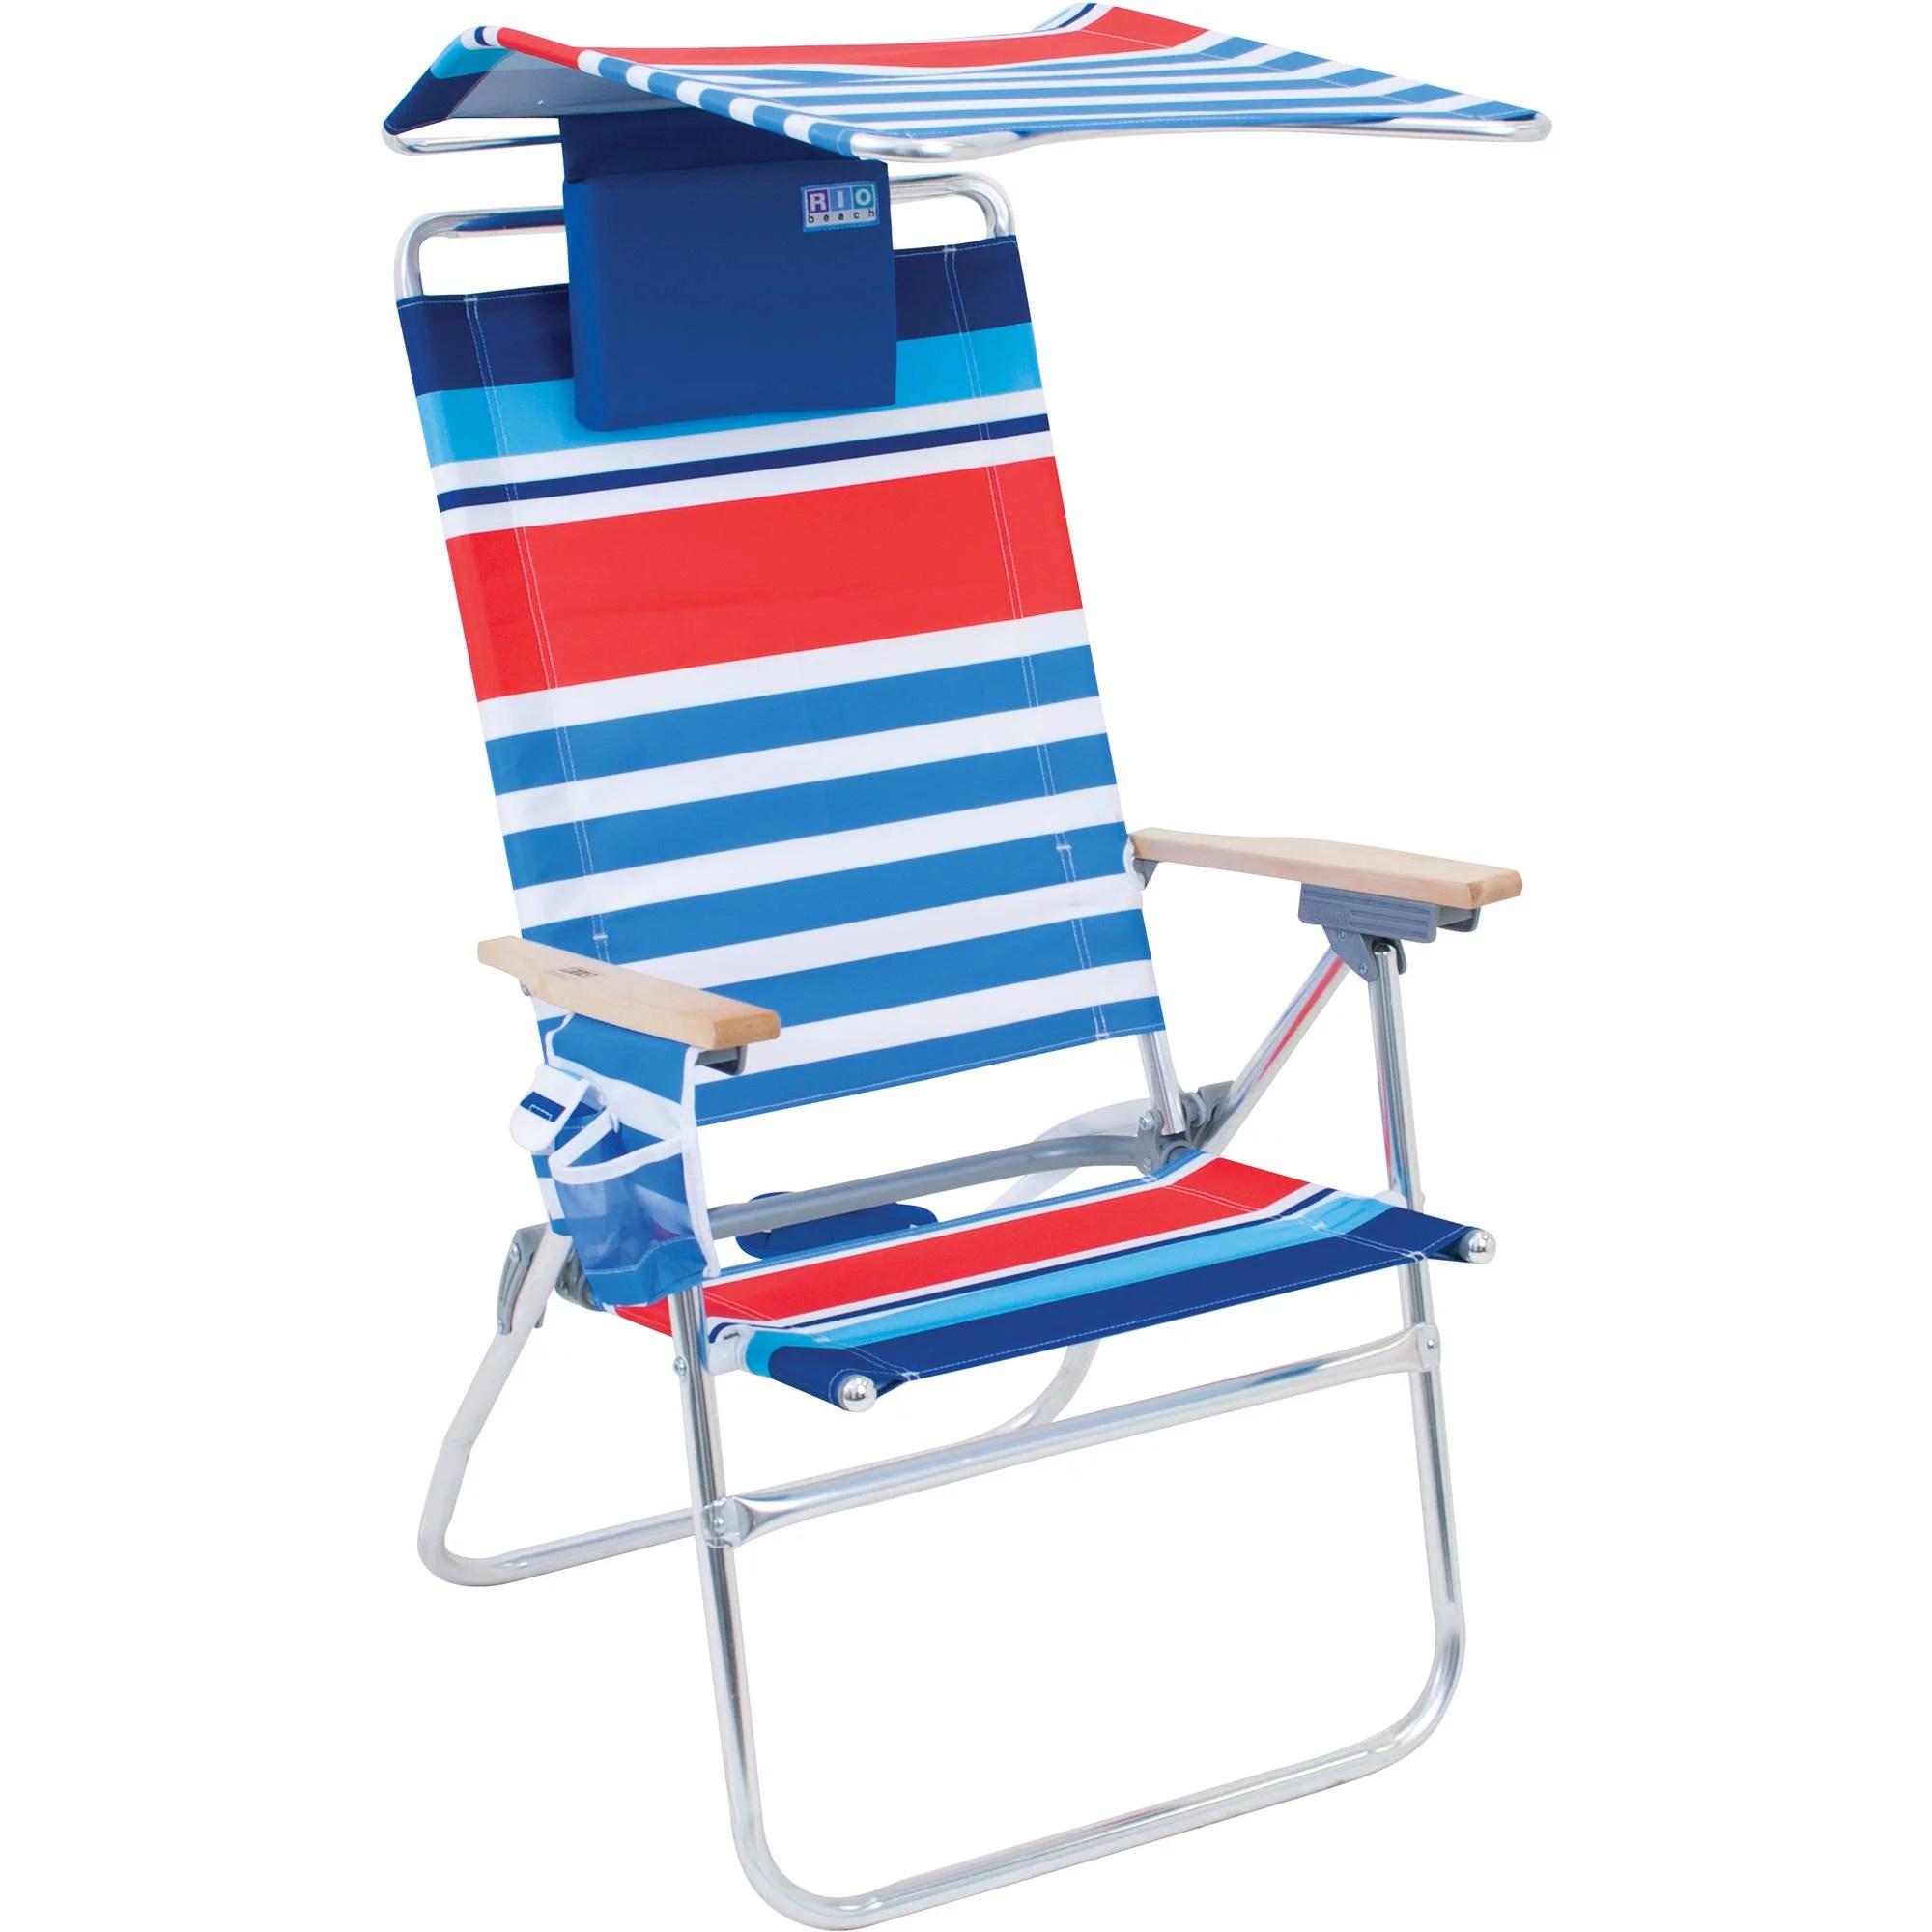 Rio HiBoy 7Position Beach Chair with Adjustable Canopy